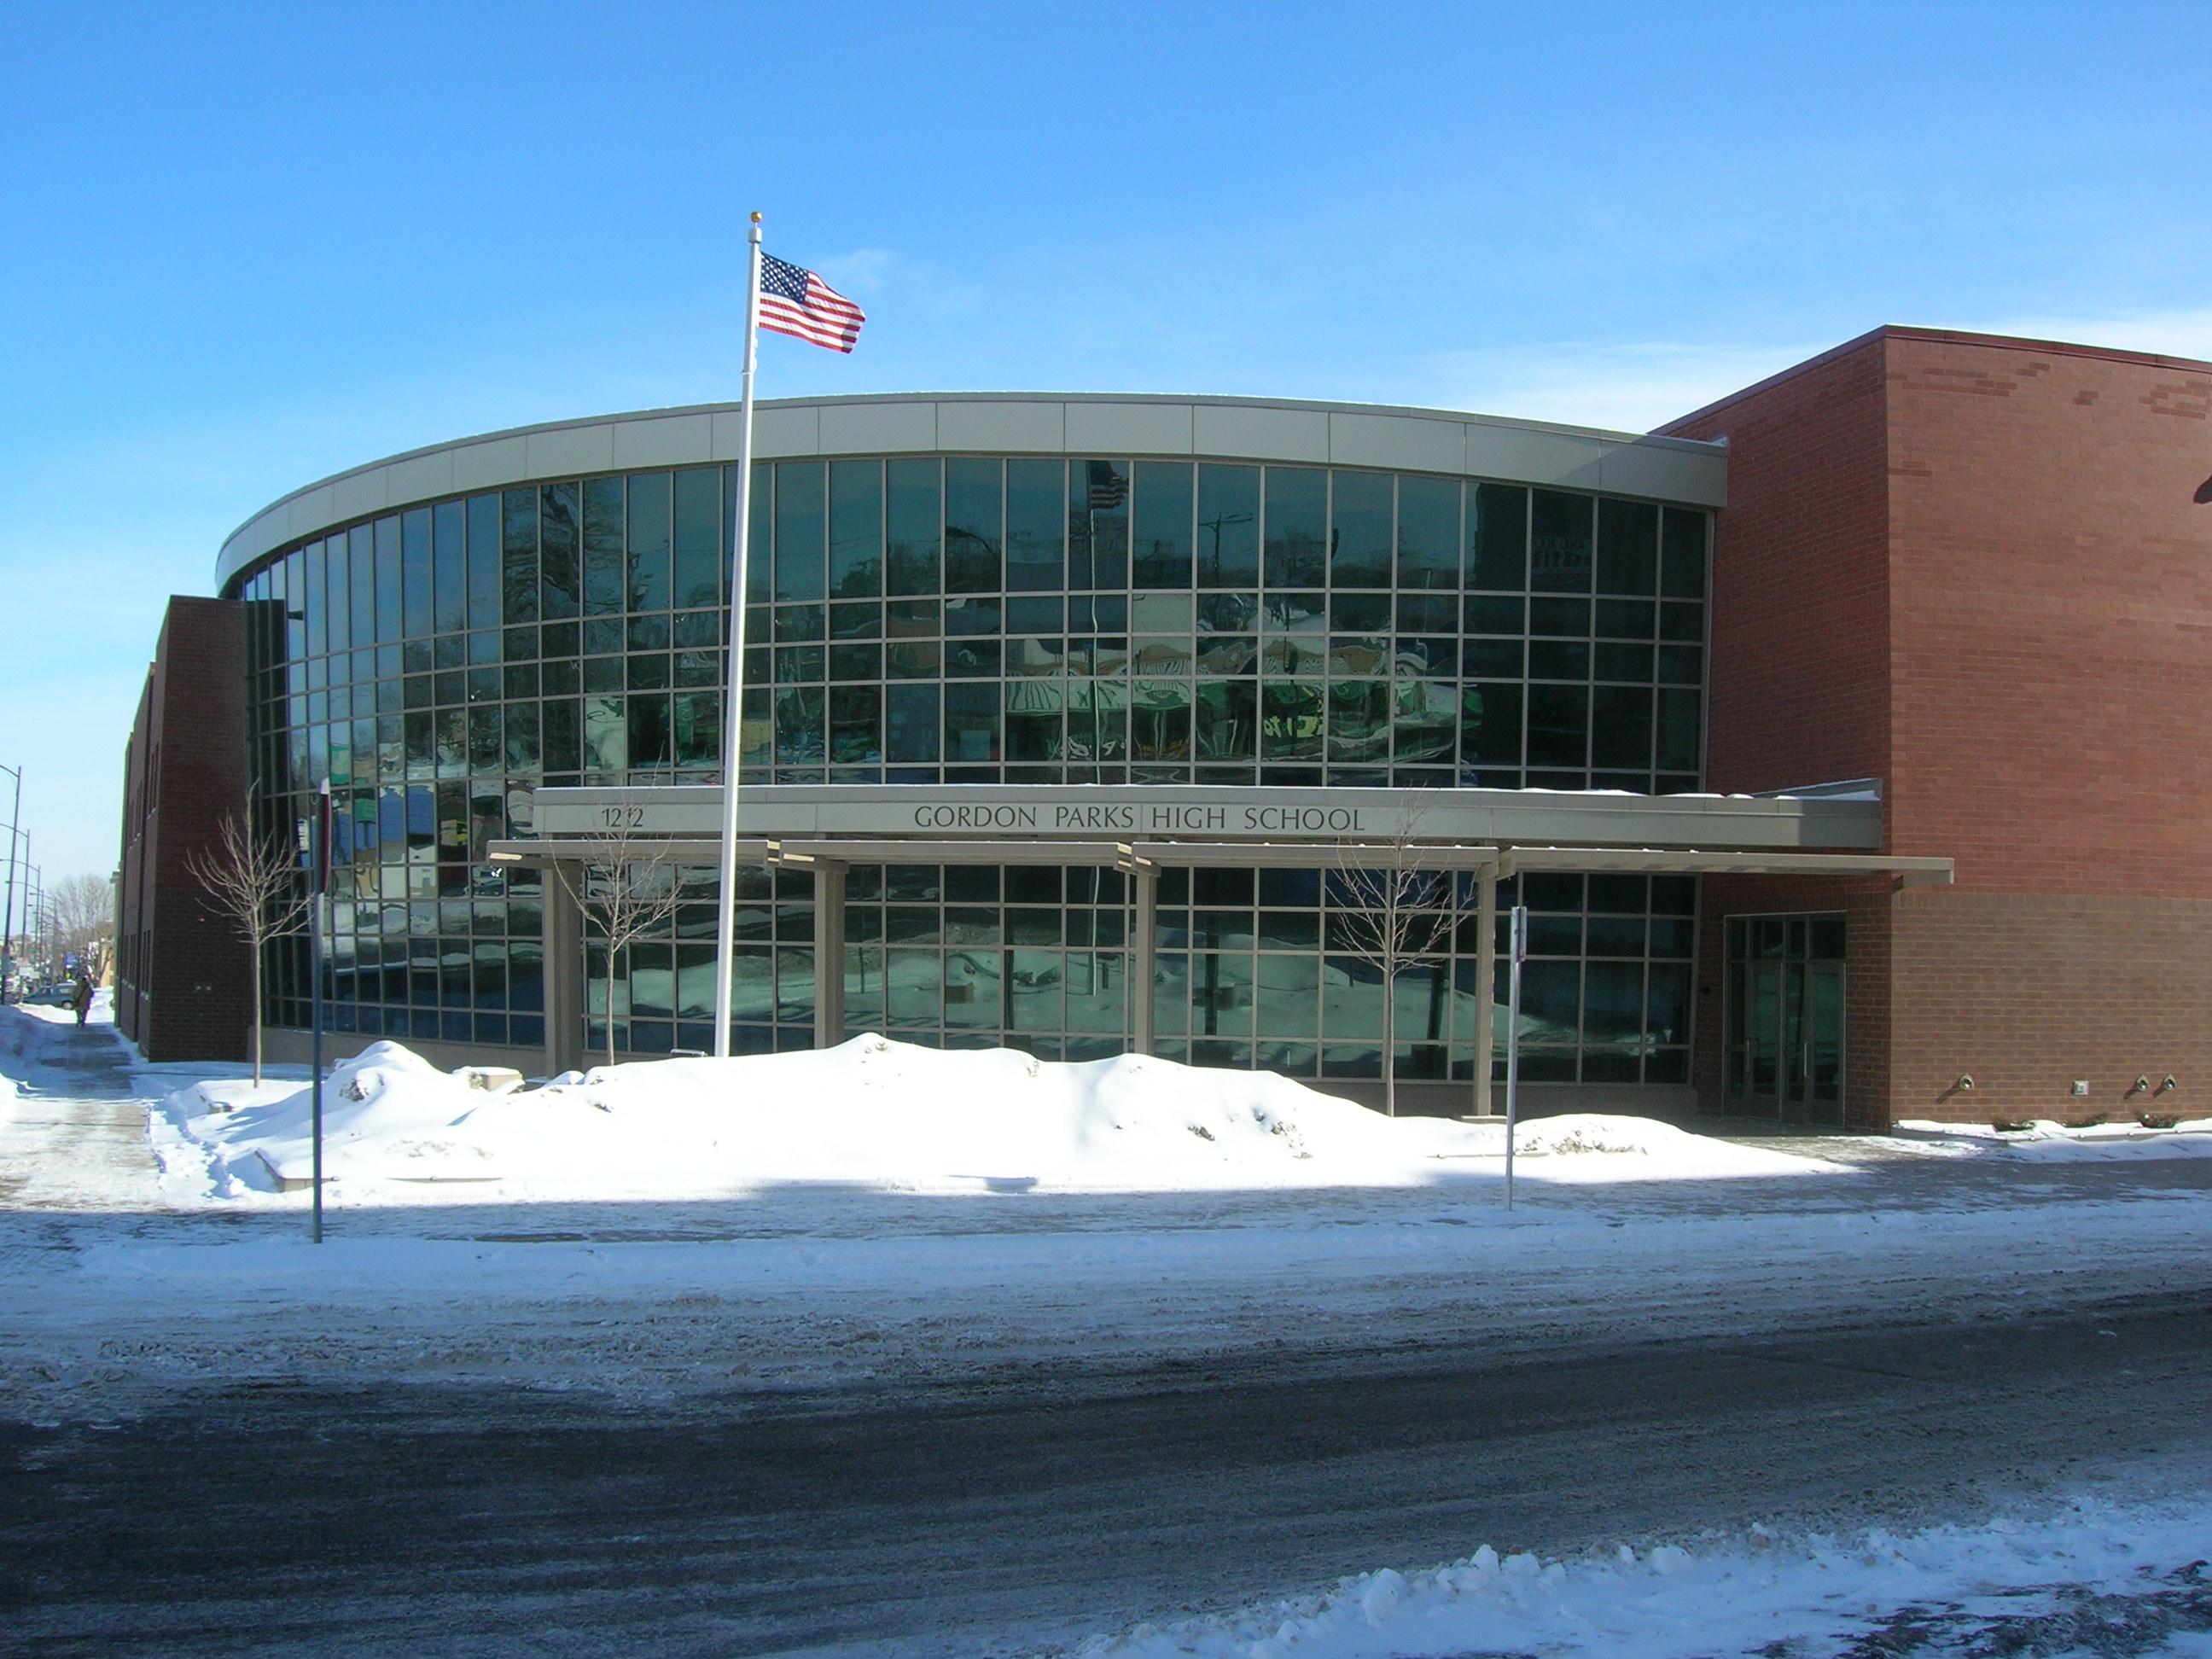 File:Gordon Parks High School entrance.JPG